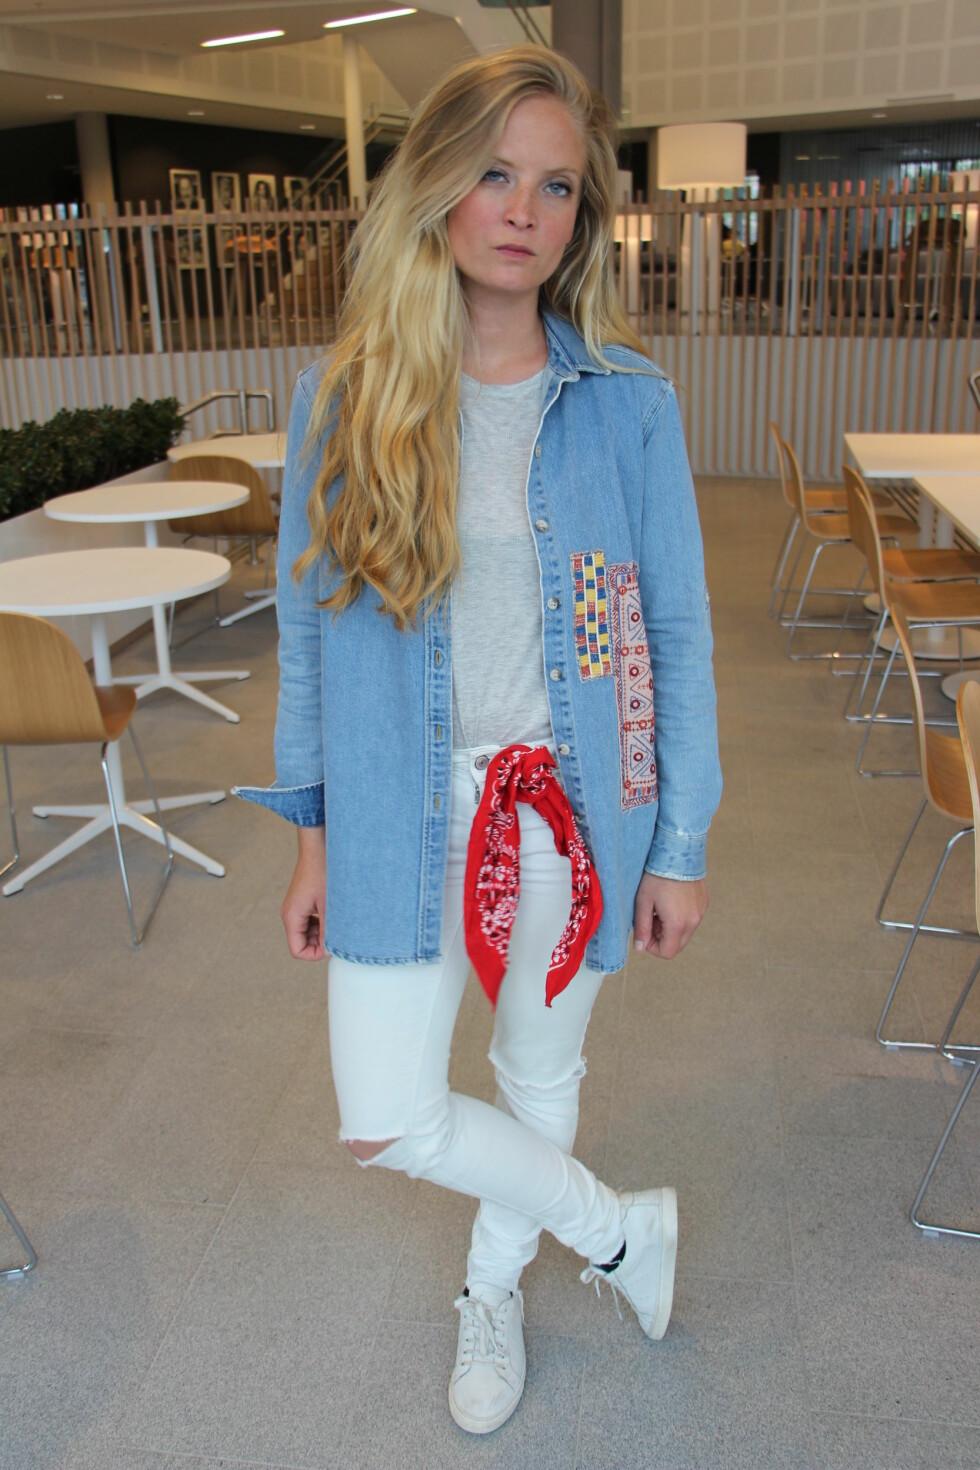 KNYT DEN FAST: Her har Nathalie festet den i jeansen. Foto: Malin Gaden